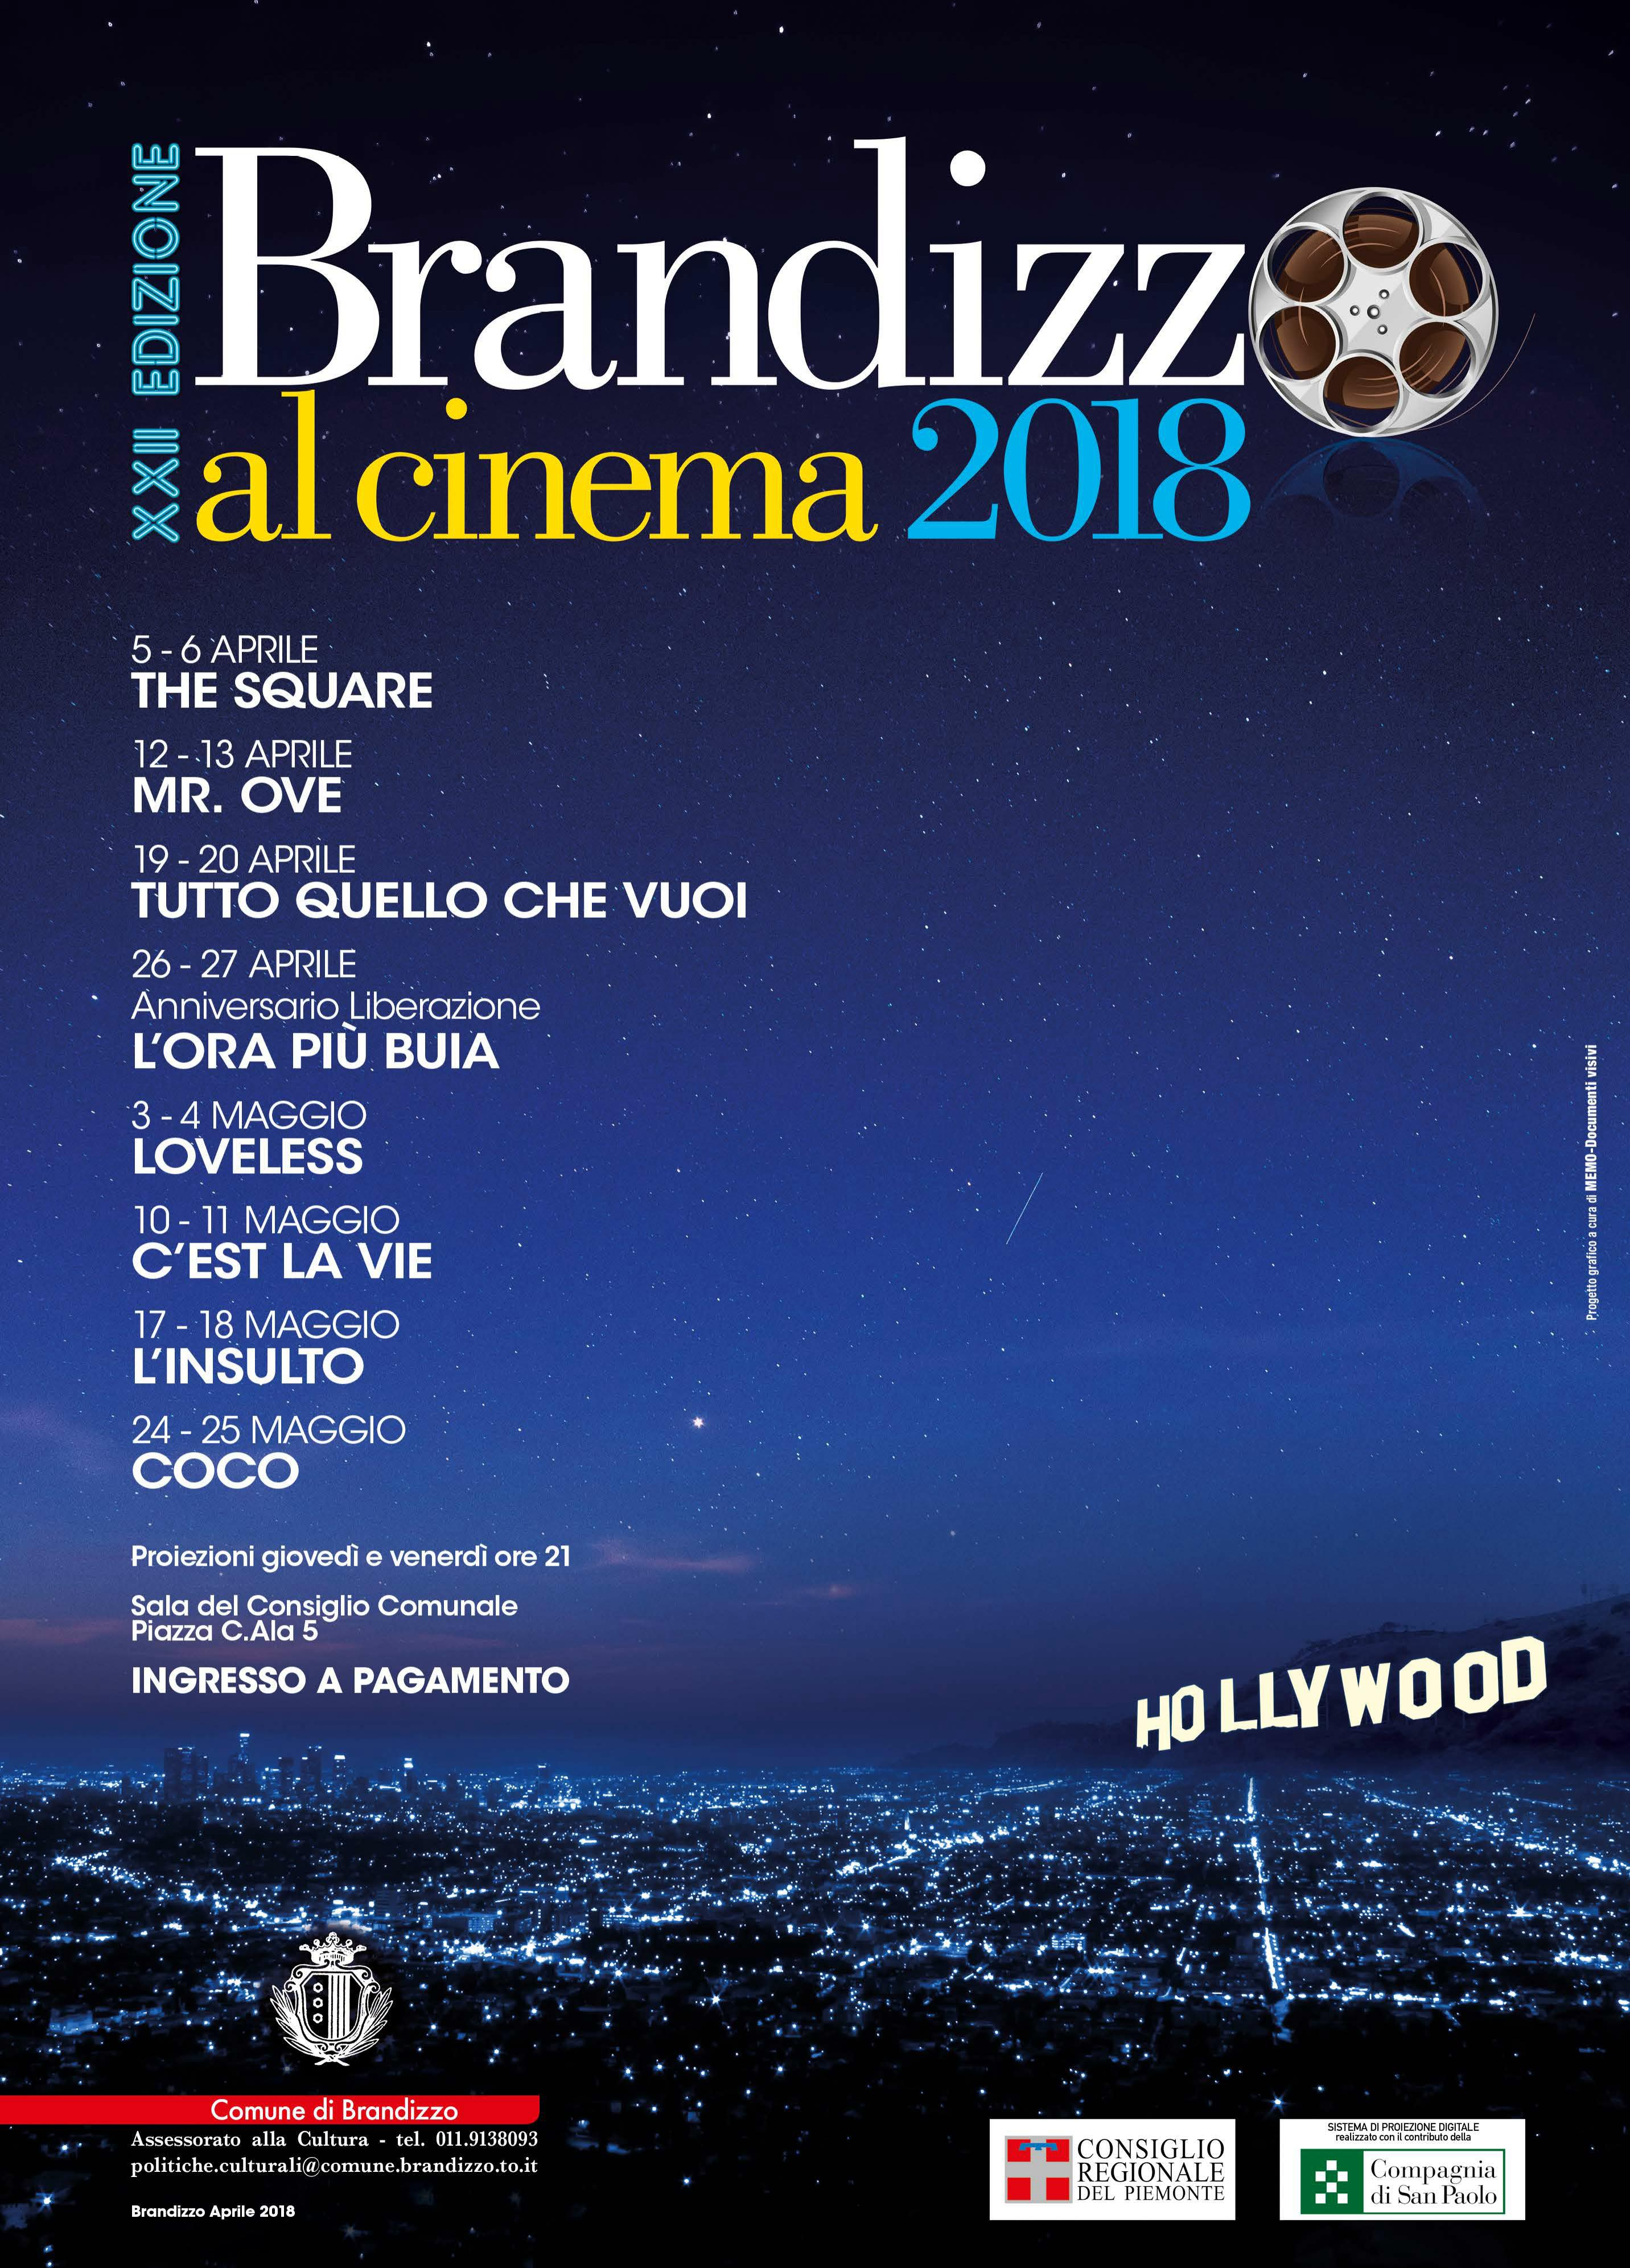 Brandizzo_cinema_locandina